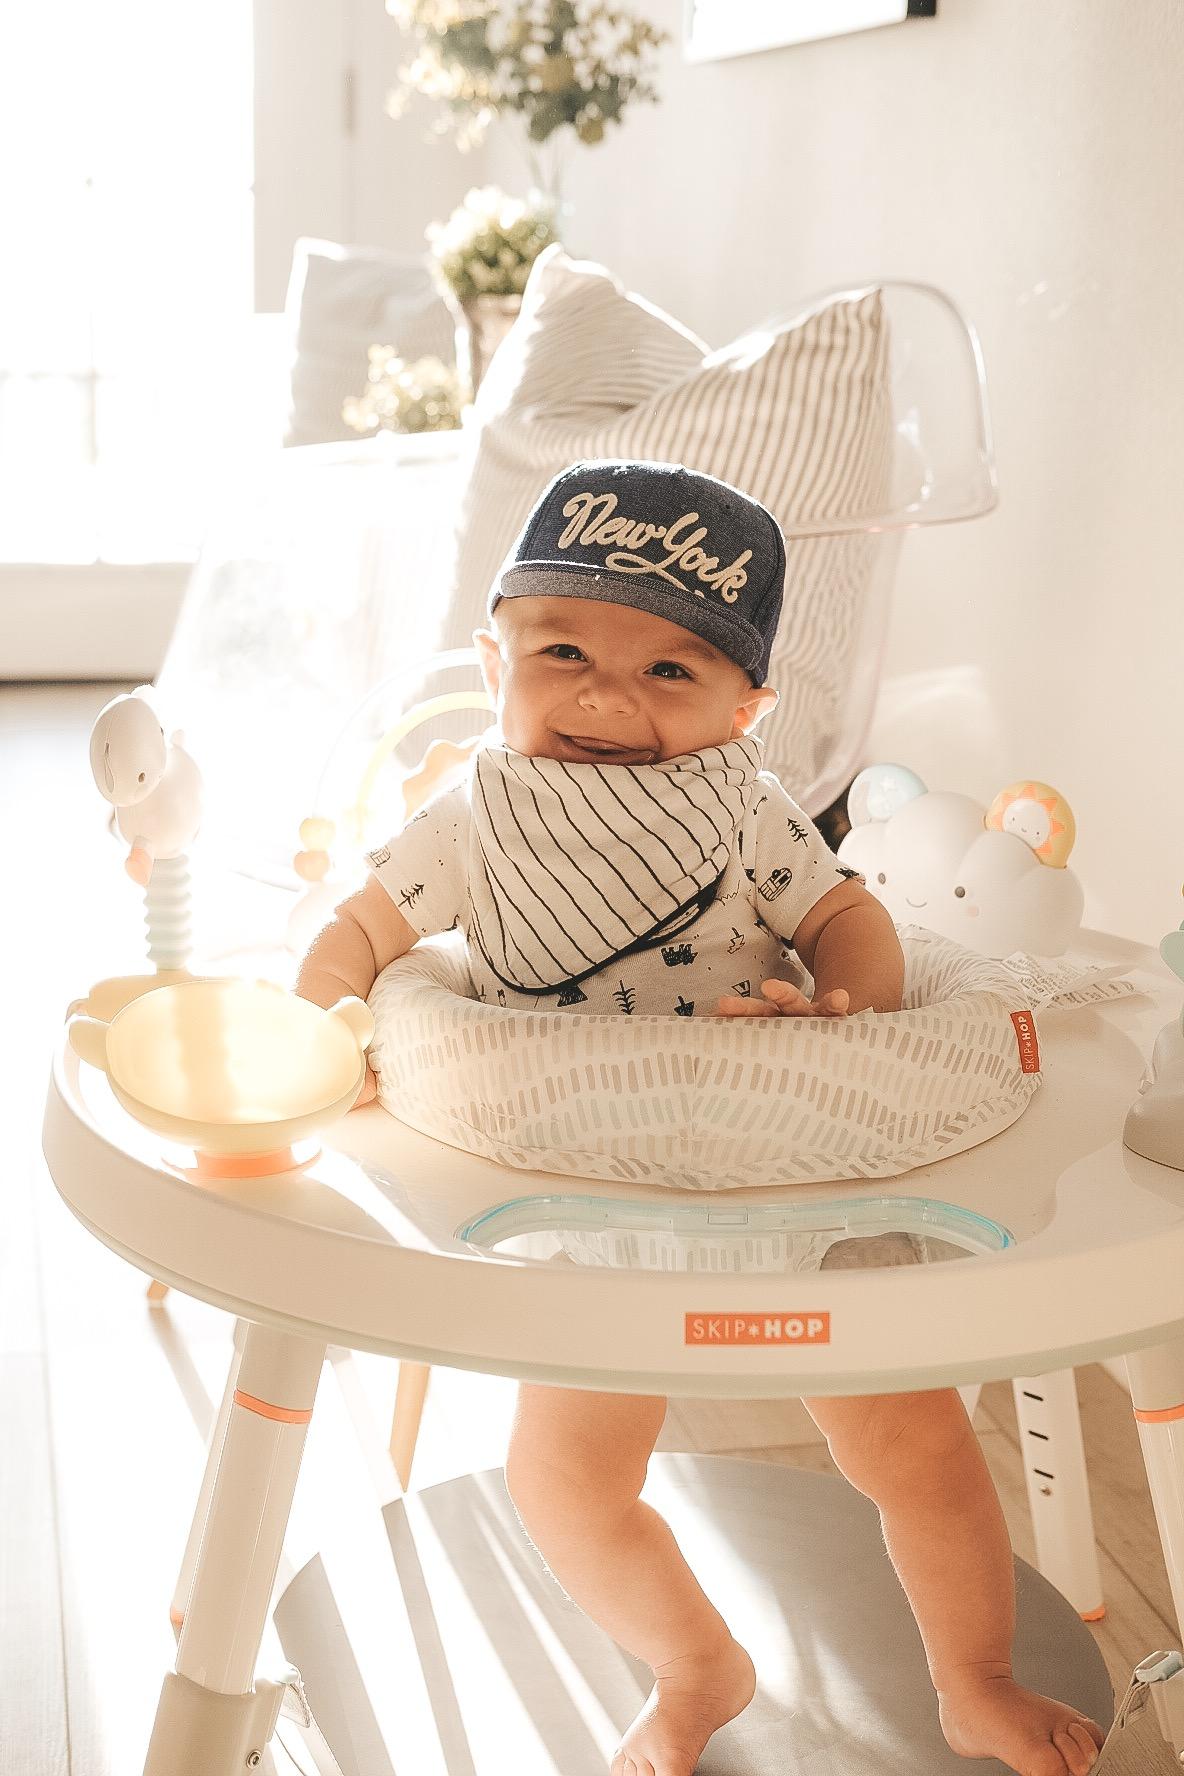 H&M baby flat bill hat.  Skip Hop activity center.  Jett Jones.